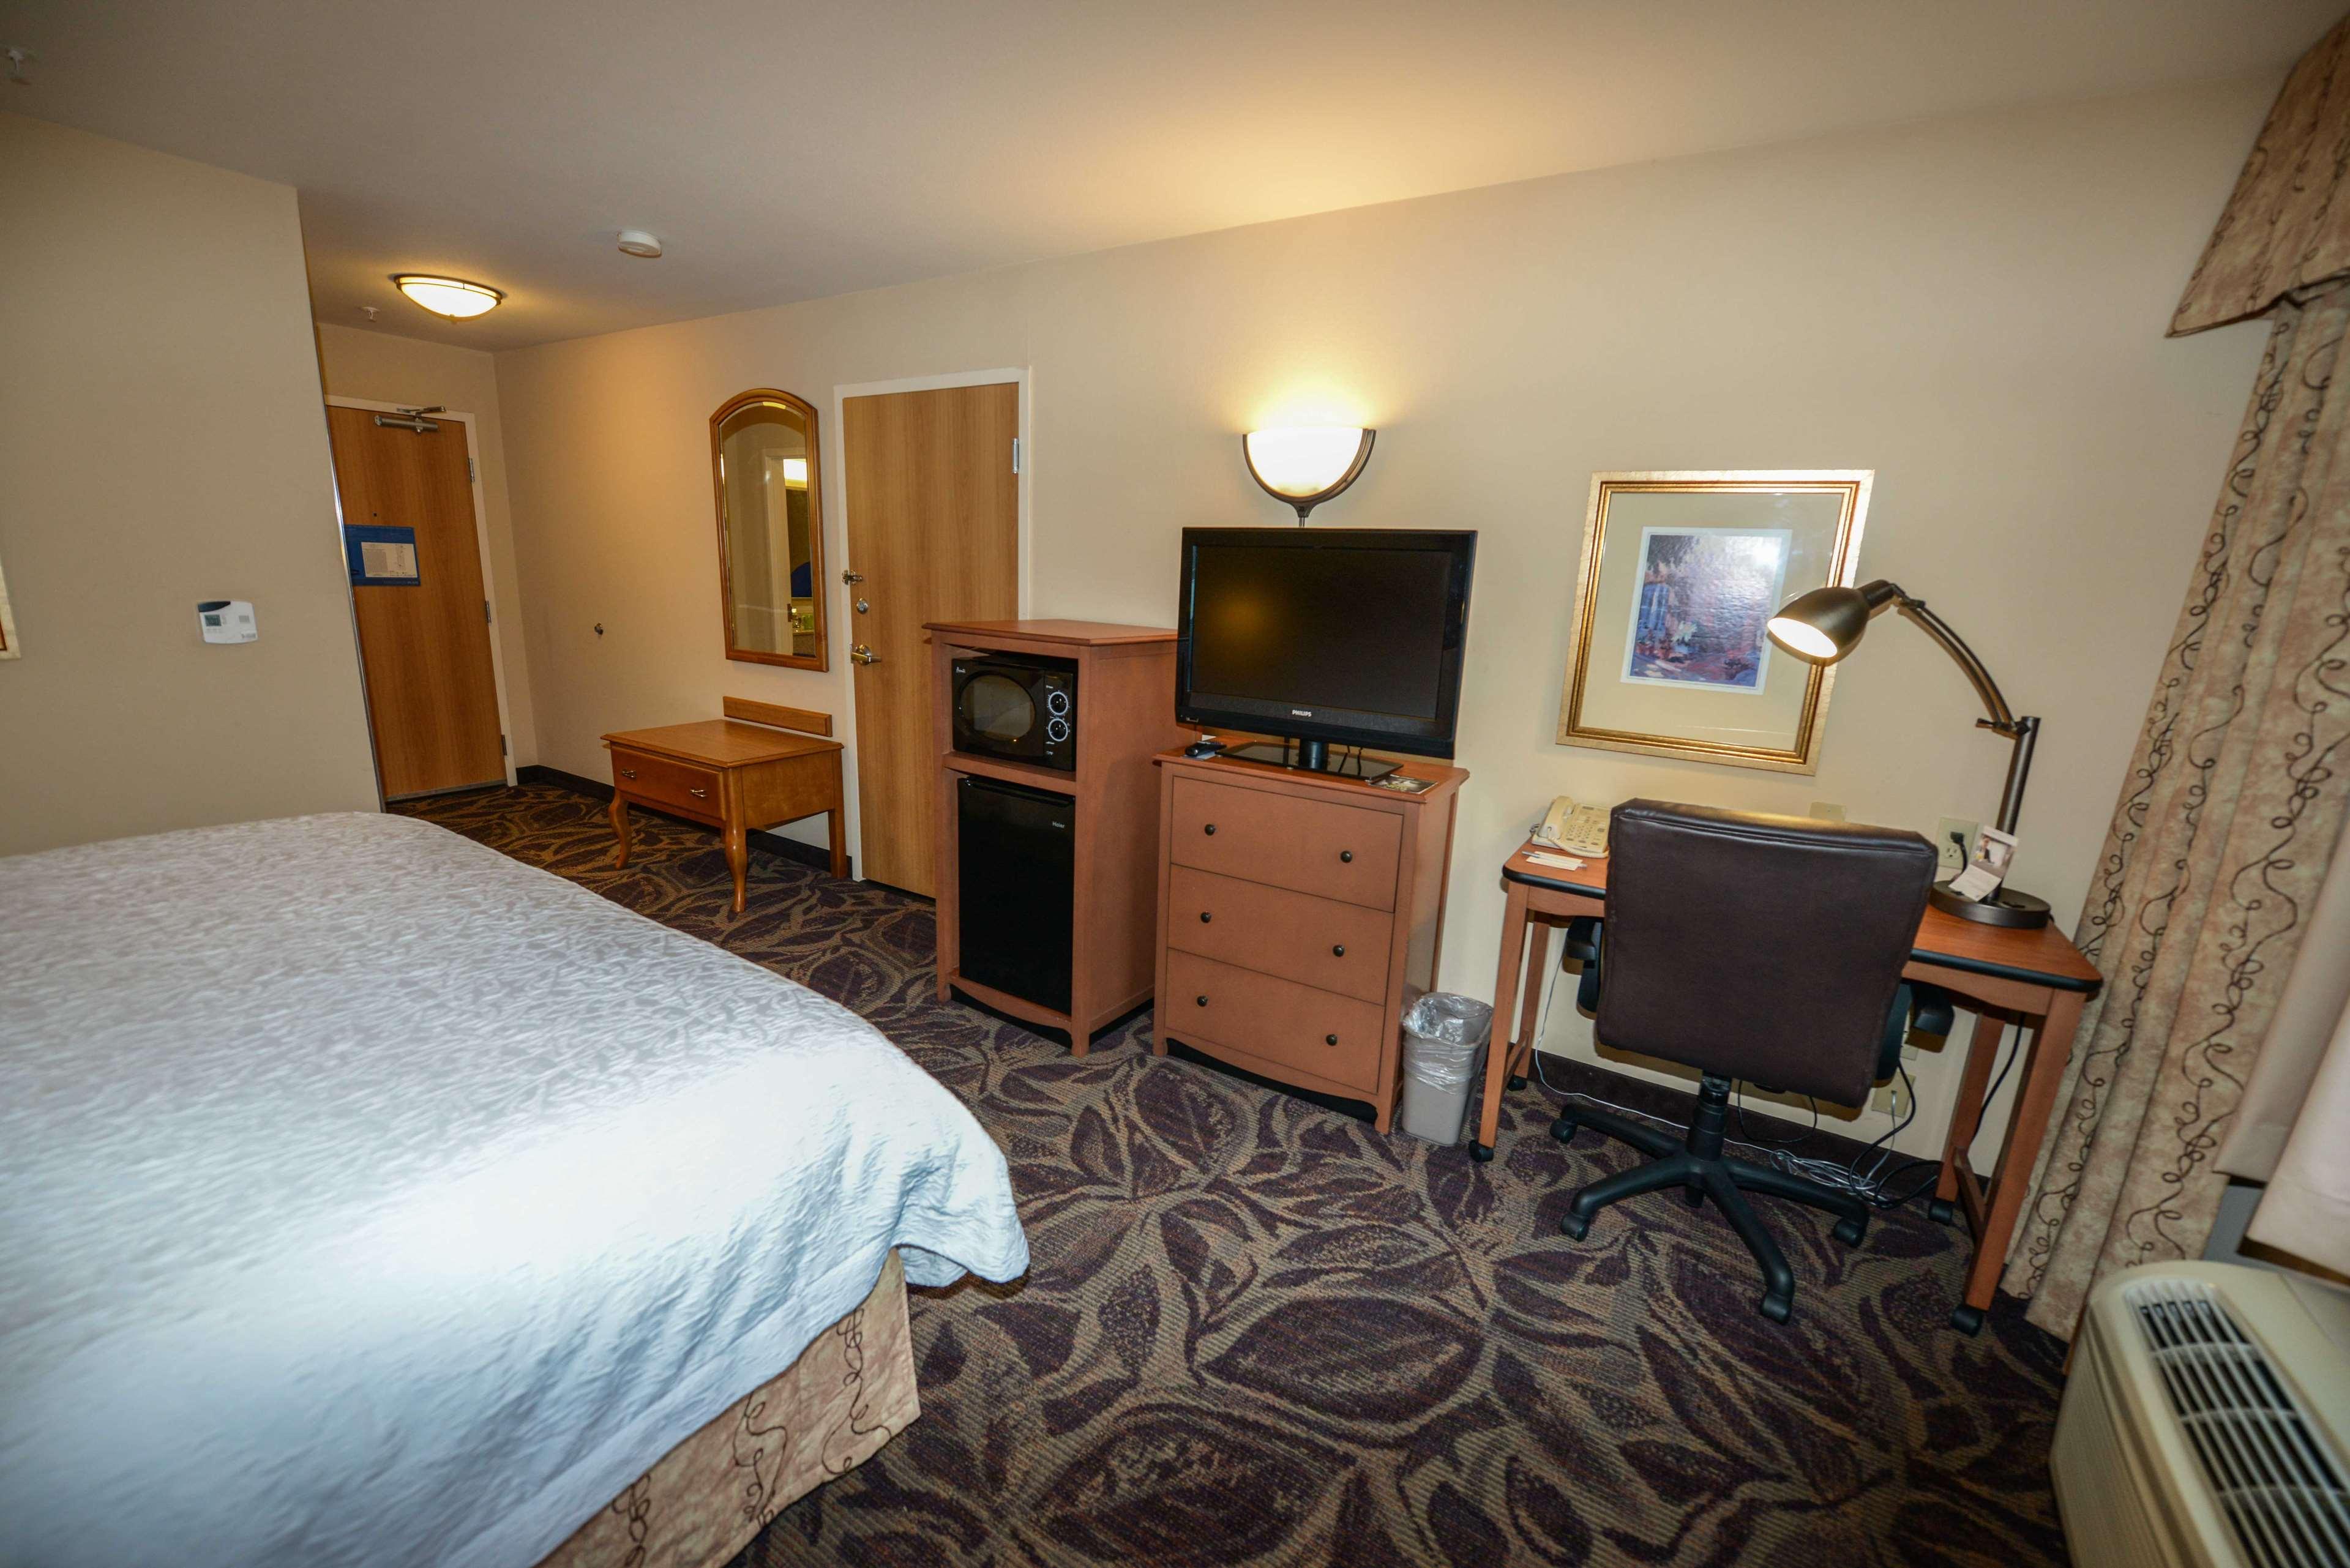 Hampton Inn & Suites Bremerton image 27